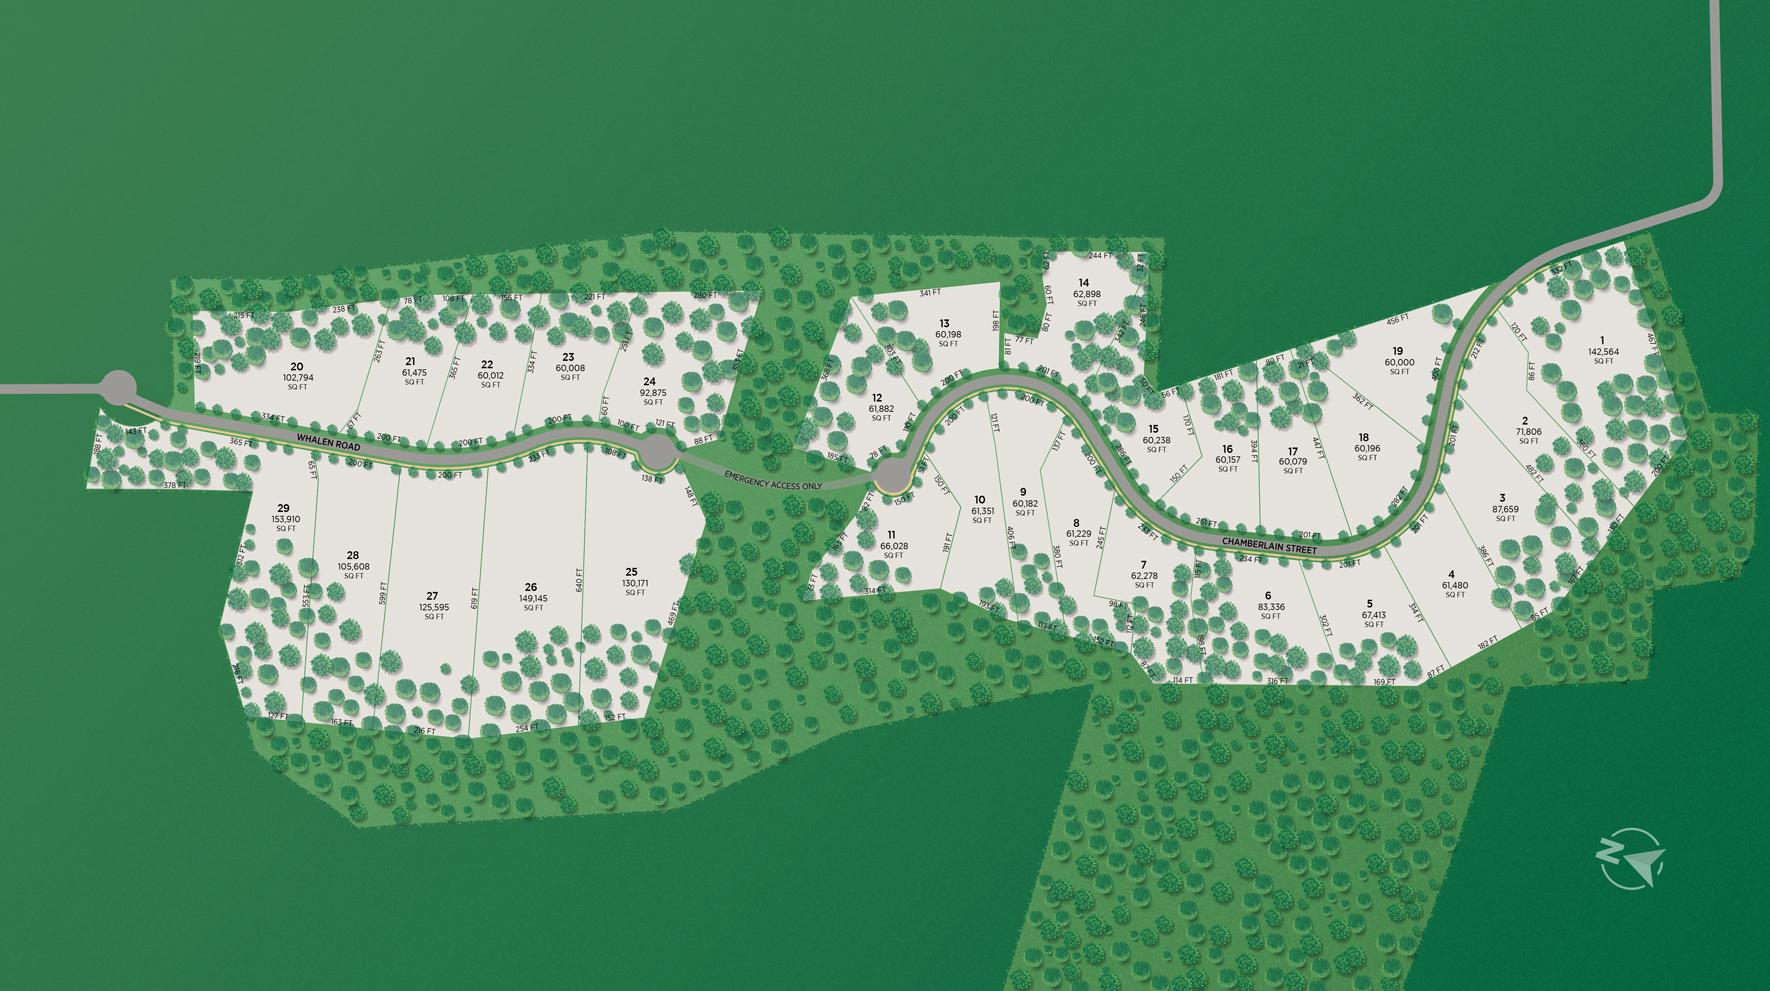 Edgewood at Hopkinton - Overall Site Plan